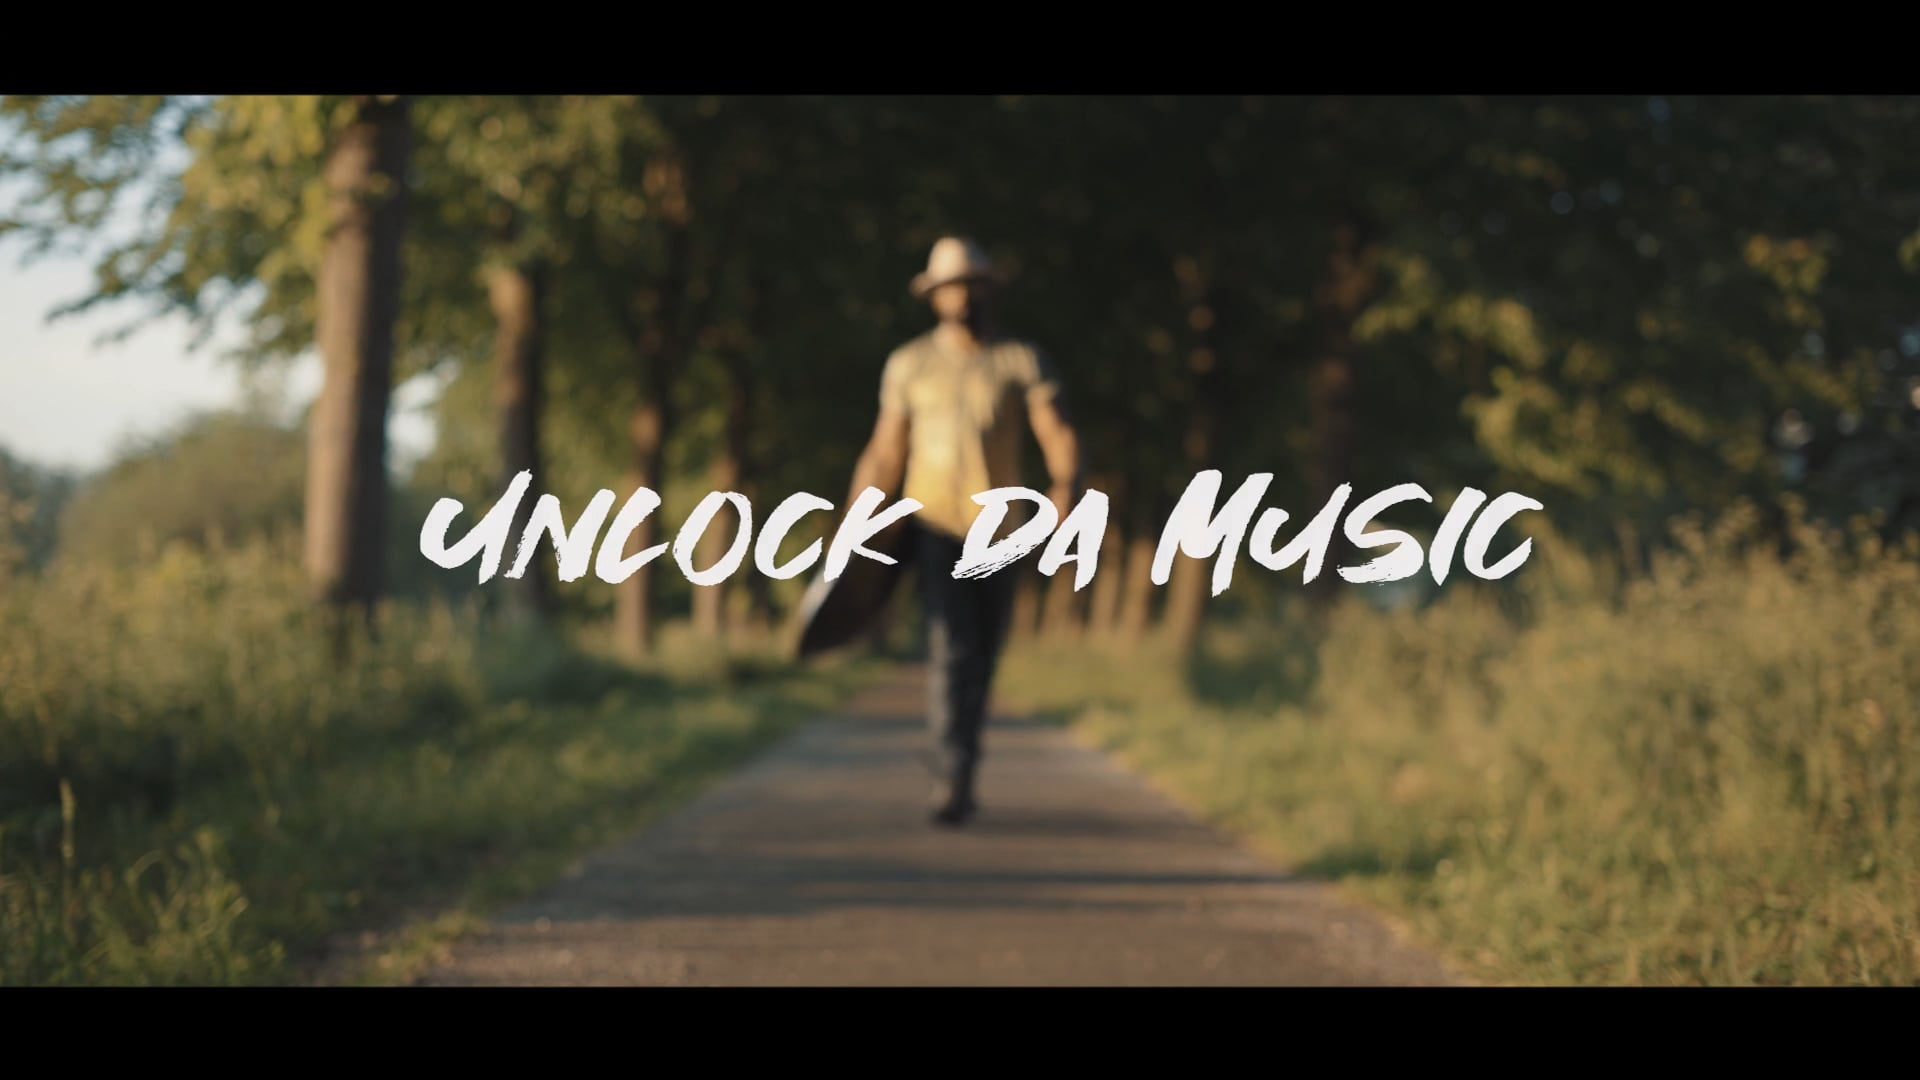 Unlock DA Music ft. Kevin Valentine